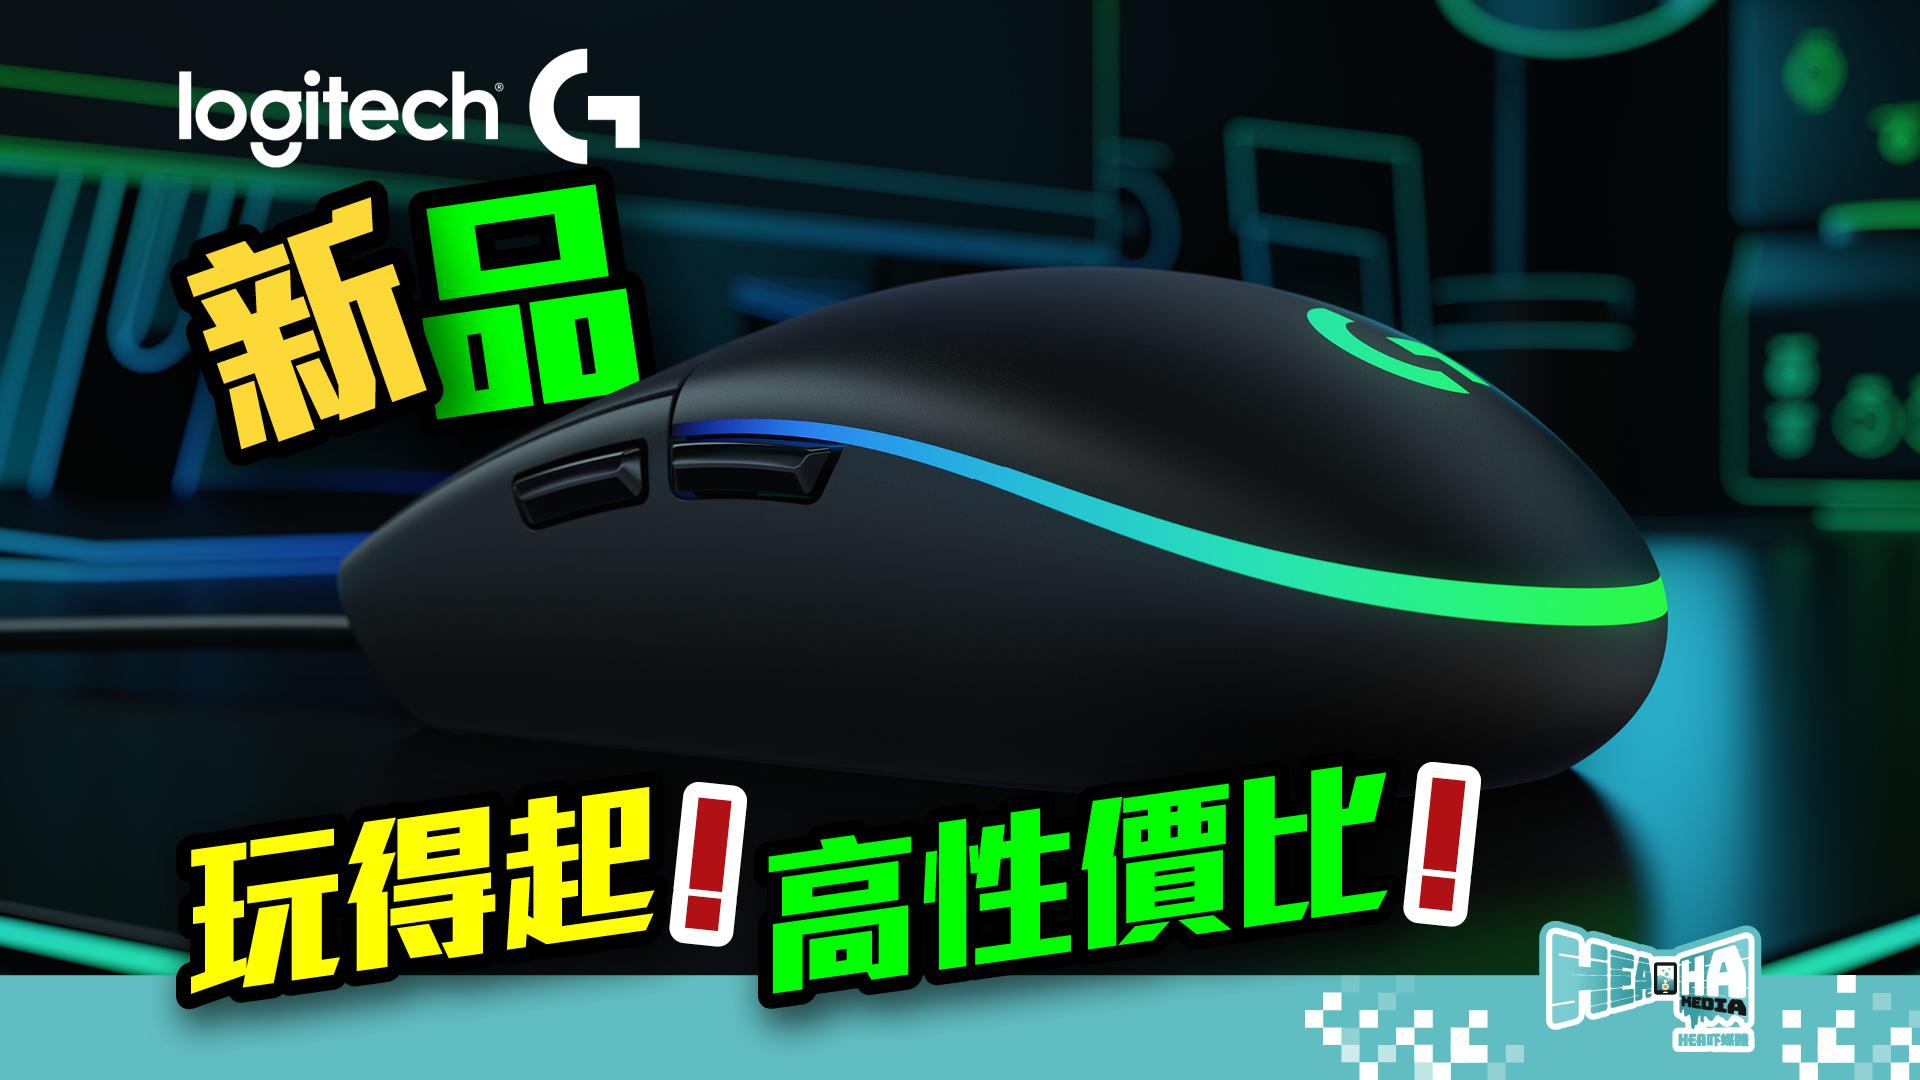 Logitech G203 LIGHTSYNC 高性能入門遊戲滑鼠   三百多元有交易